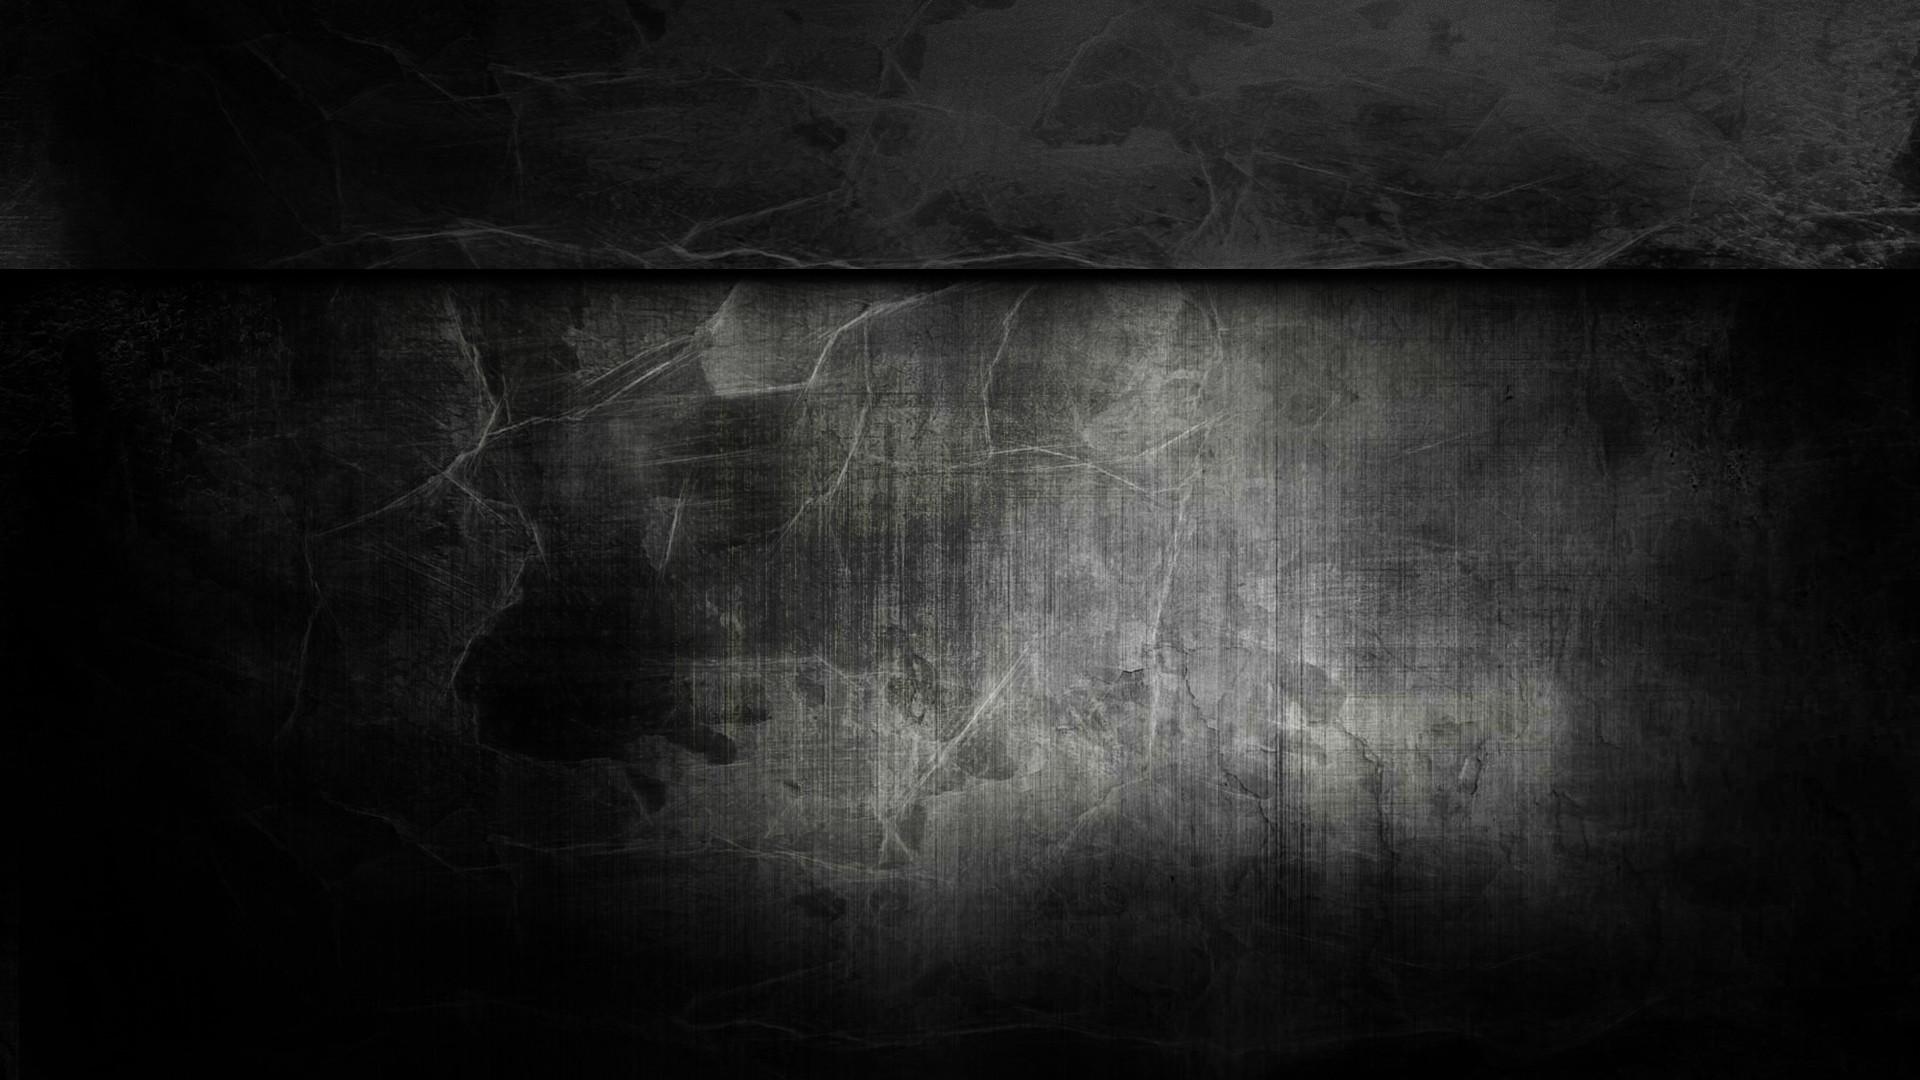 black texture wallpaper 1920x1080 - photo #30